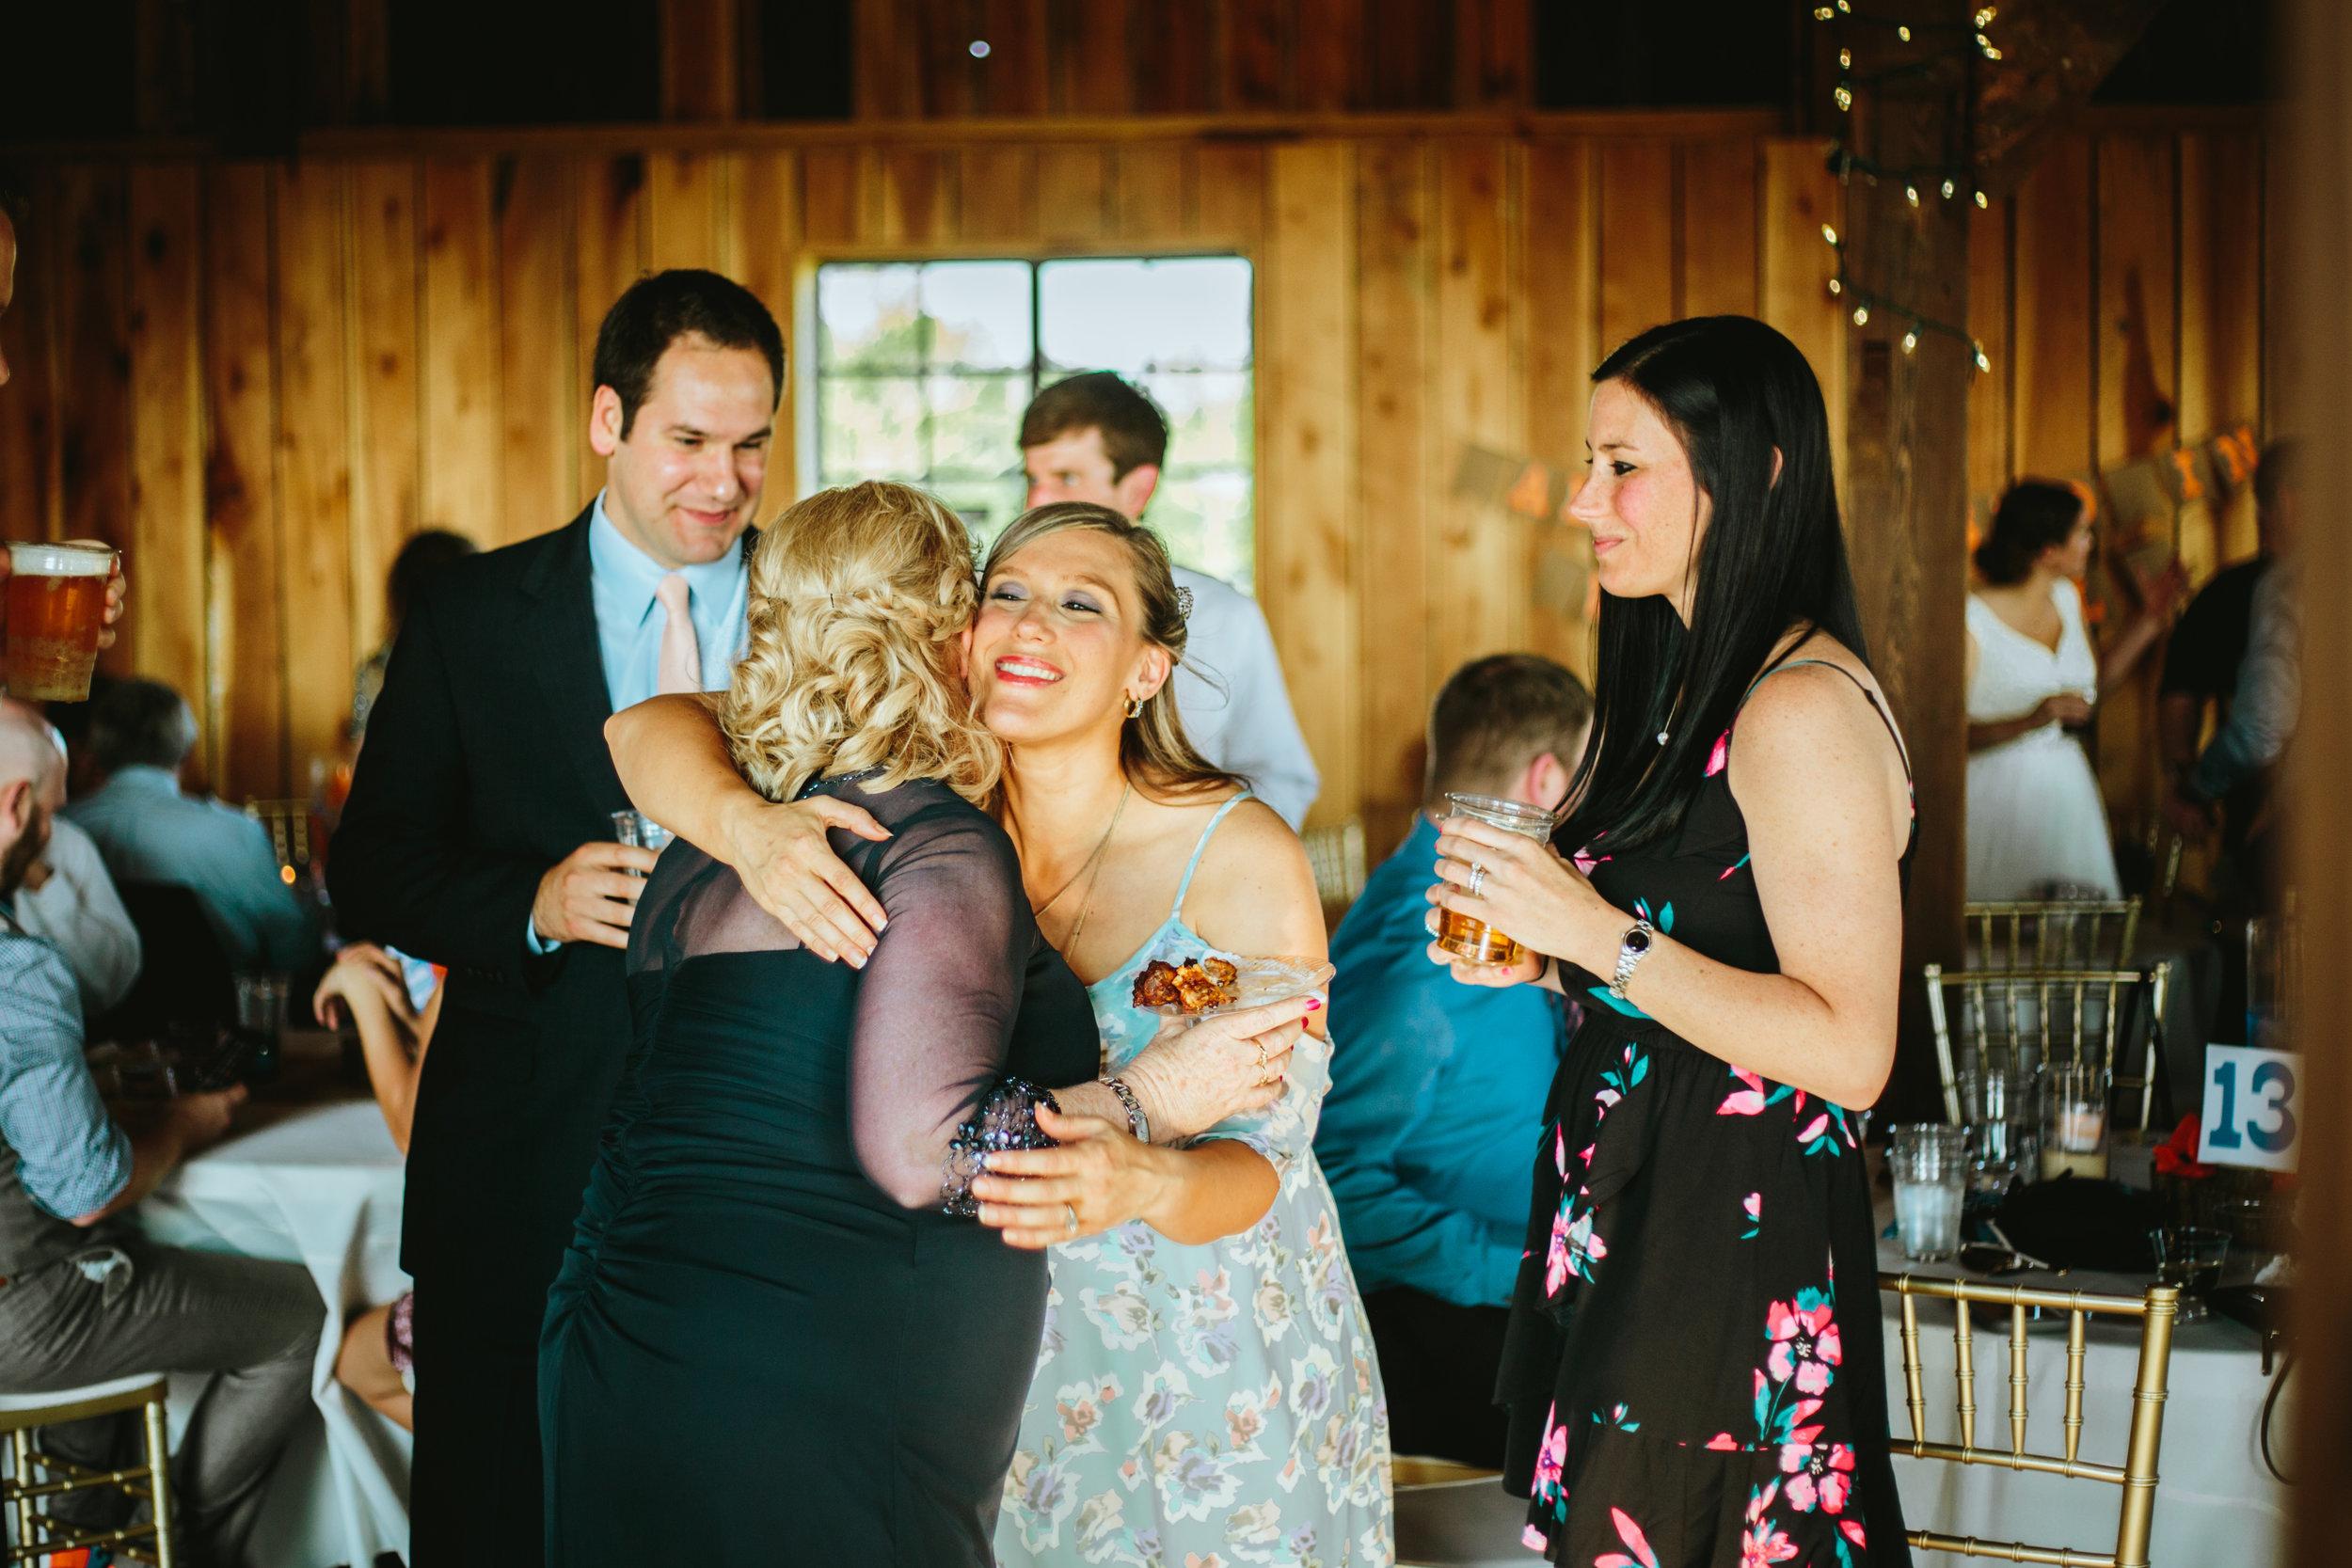 Whitesell-Mattioda Wedding-741.jpg